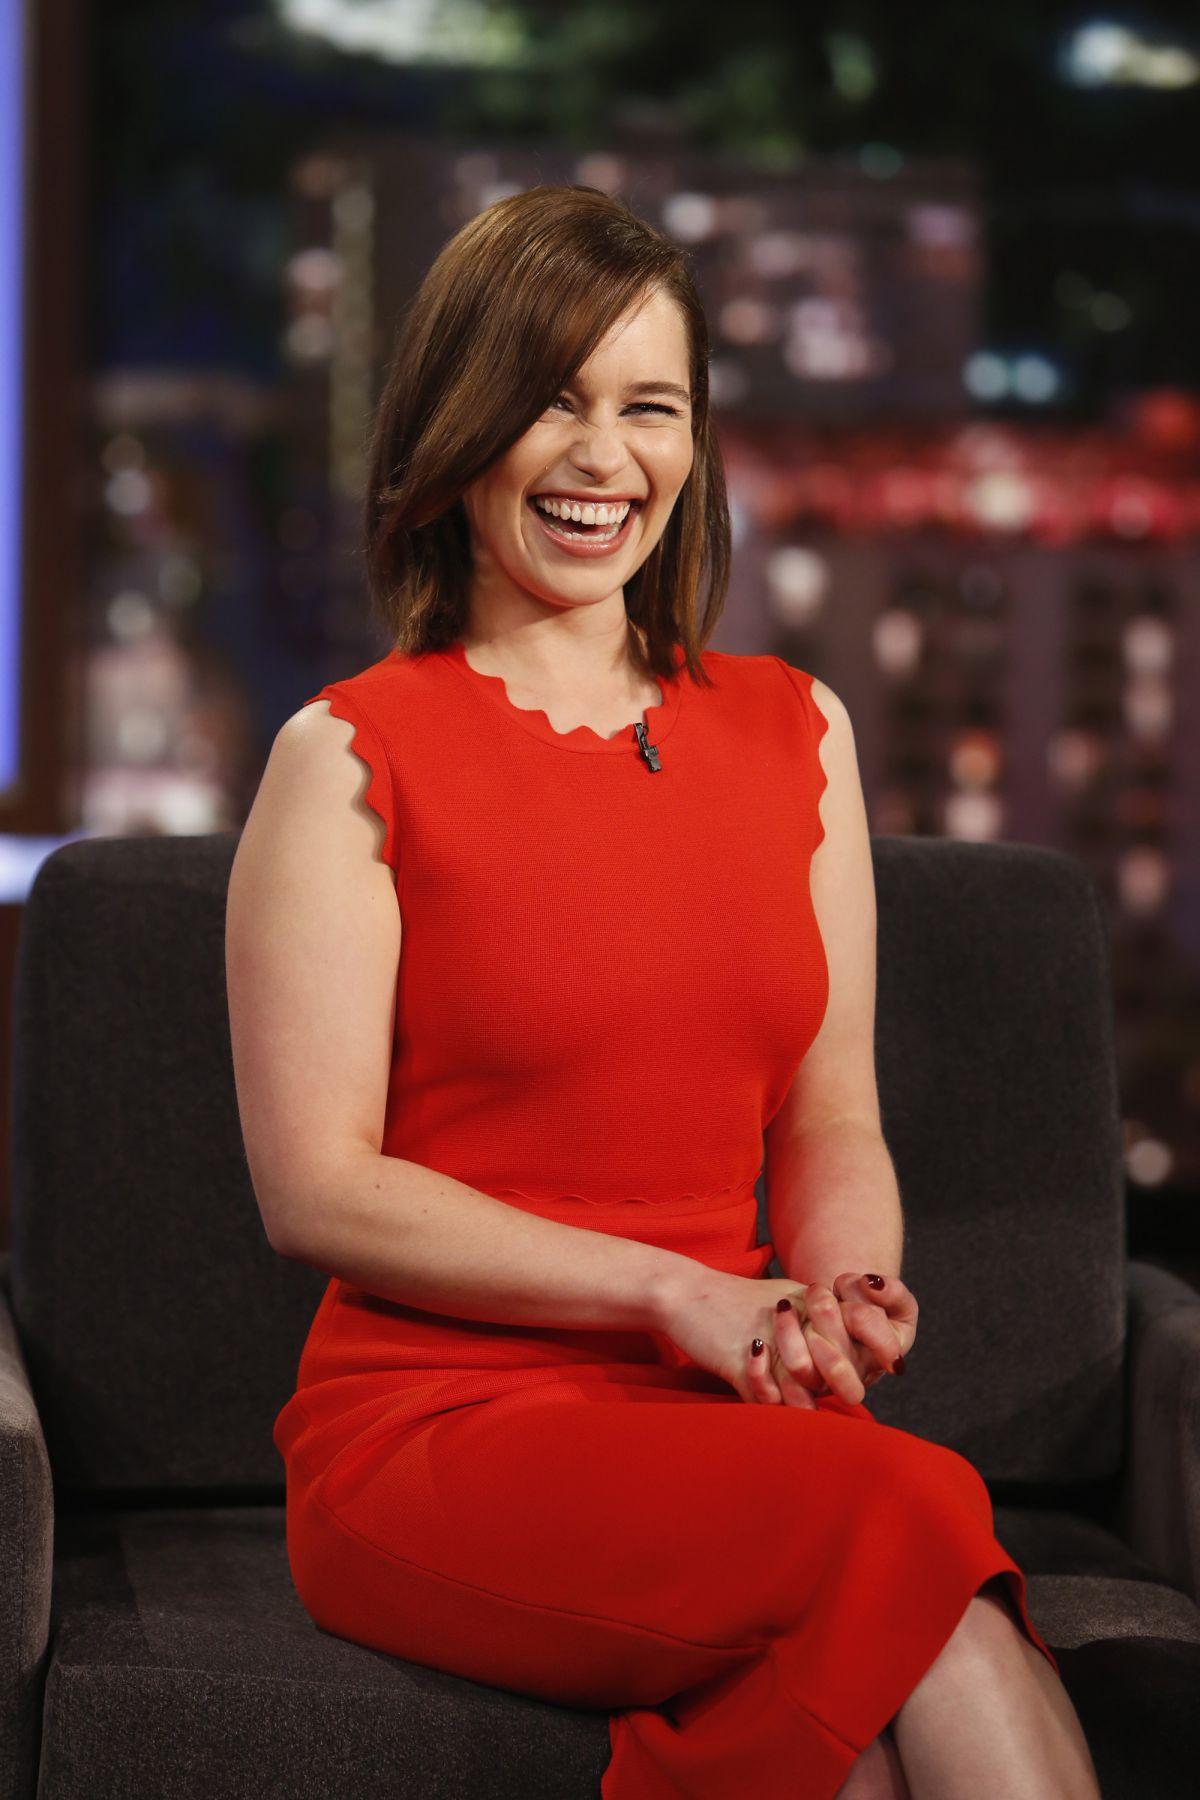 EMILIA CLARKE at Jimmy Kimmel Live! in Hollywood 06/29/2015 ...